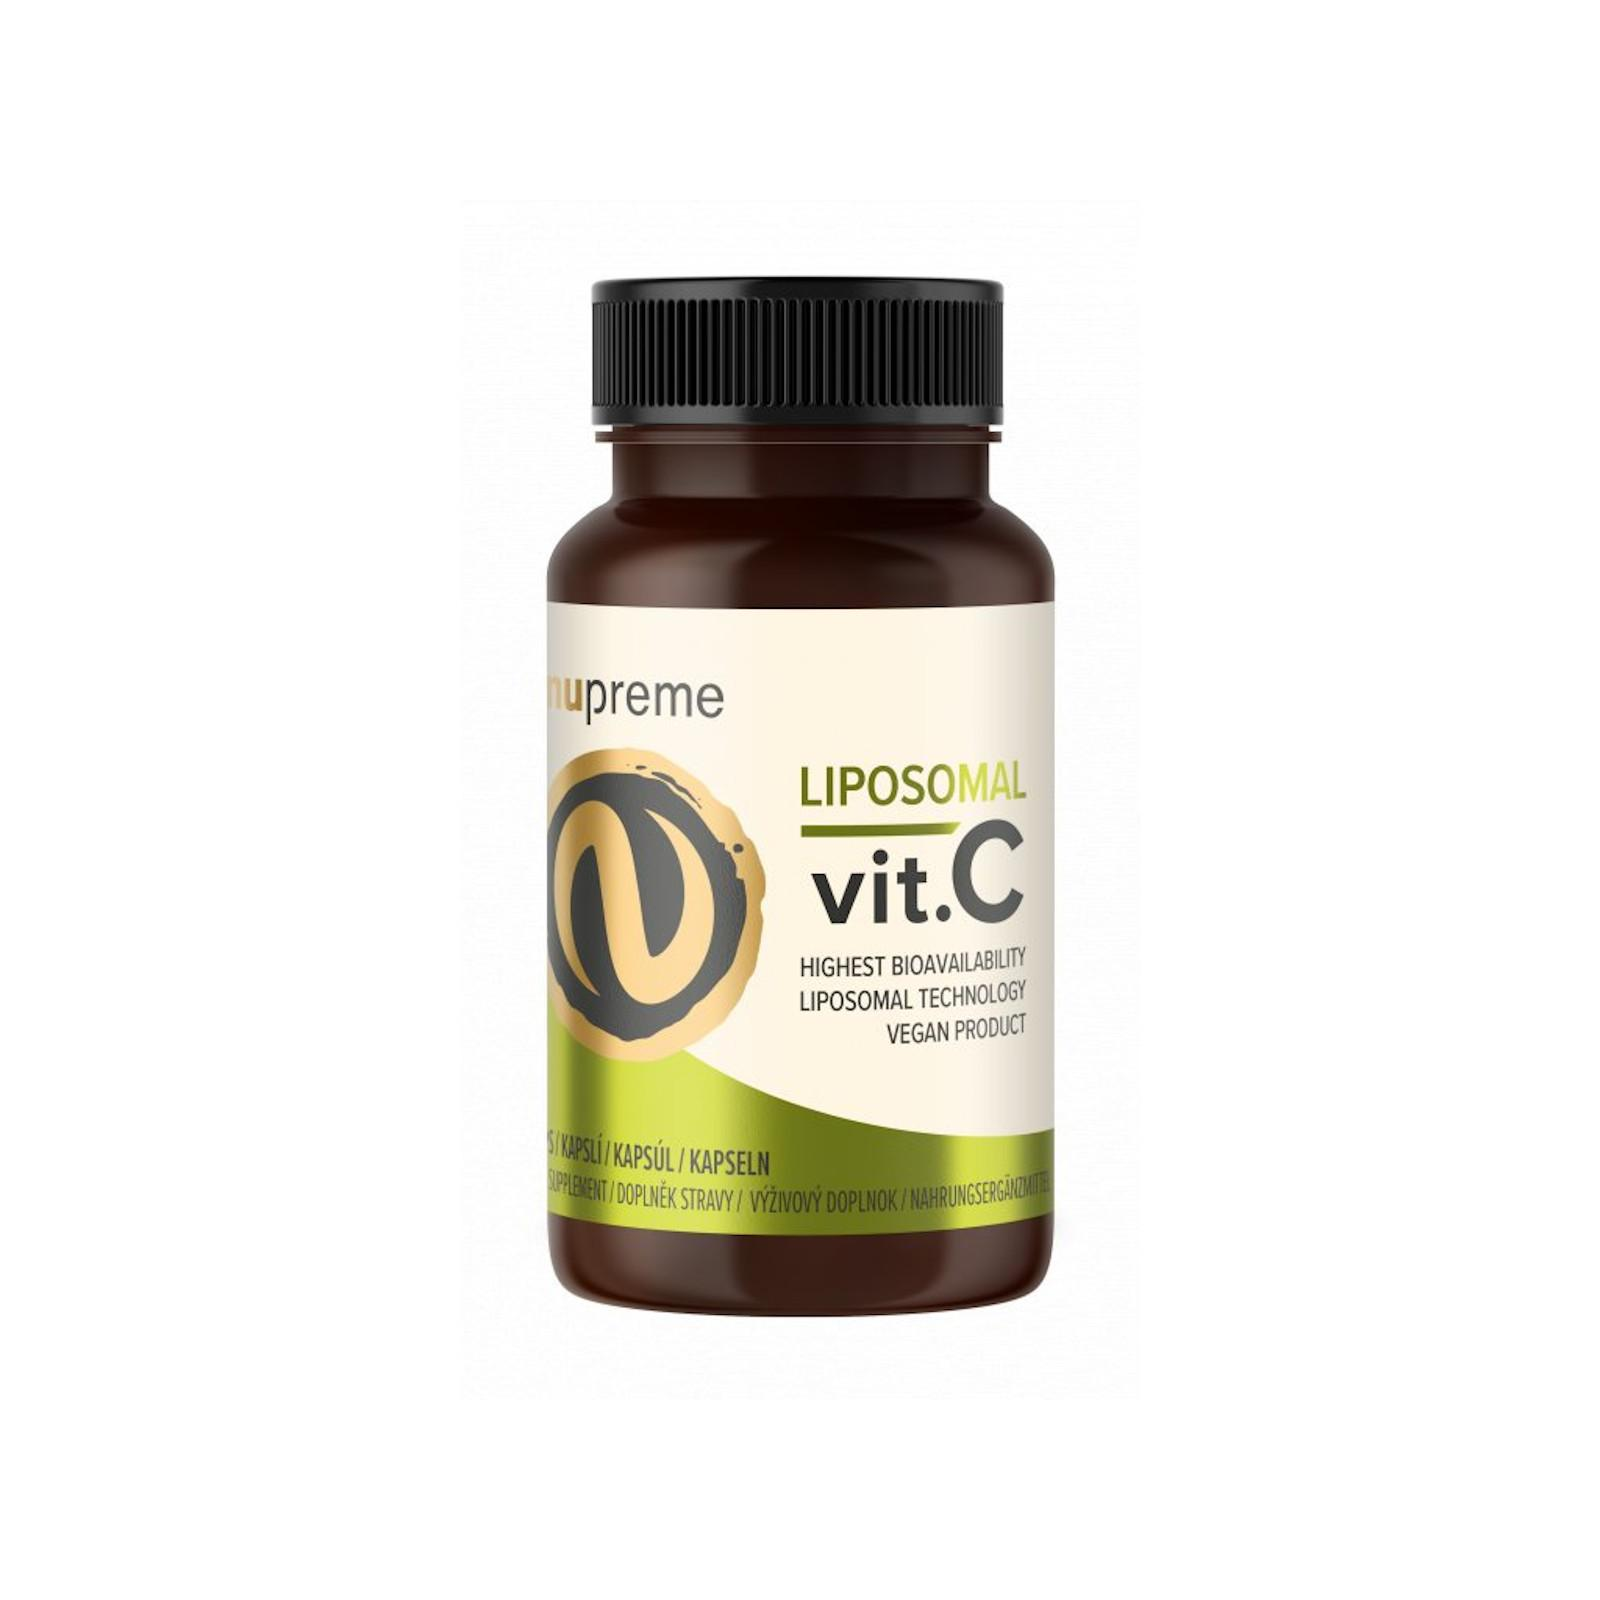 Nupreme Liposomal Vitamín C, kapsle 30 ks